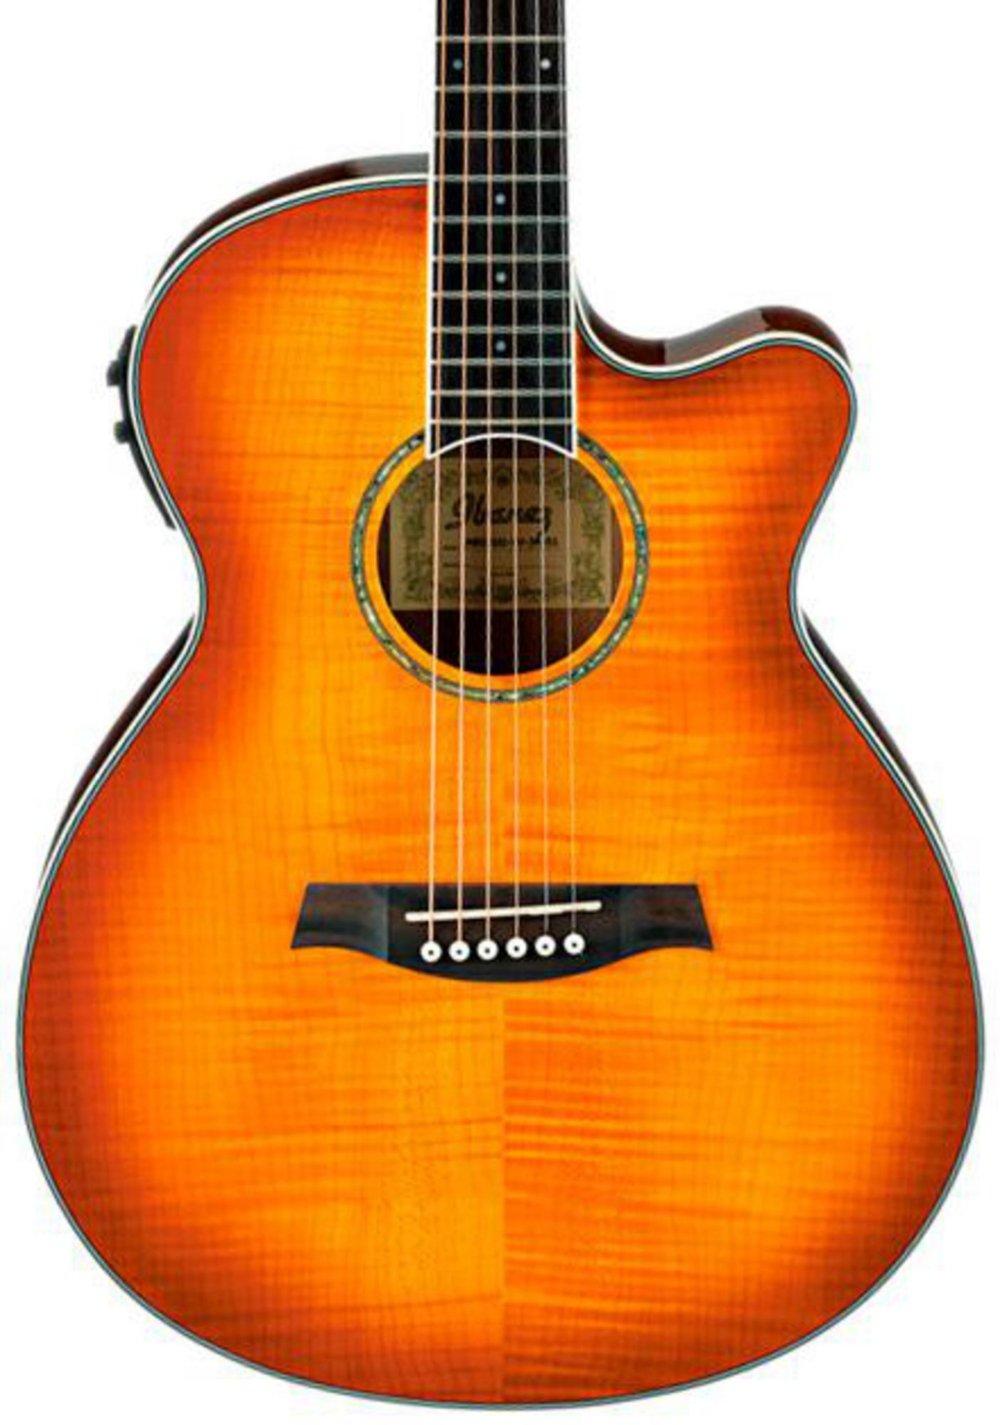 Ibanez AEG20II Flamed Sycamore Top Cutaway Acoustic-Electric Guitar Vintage Violin